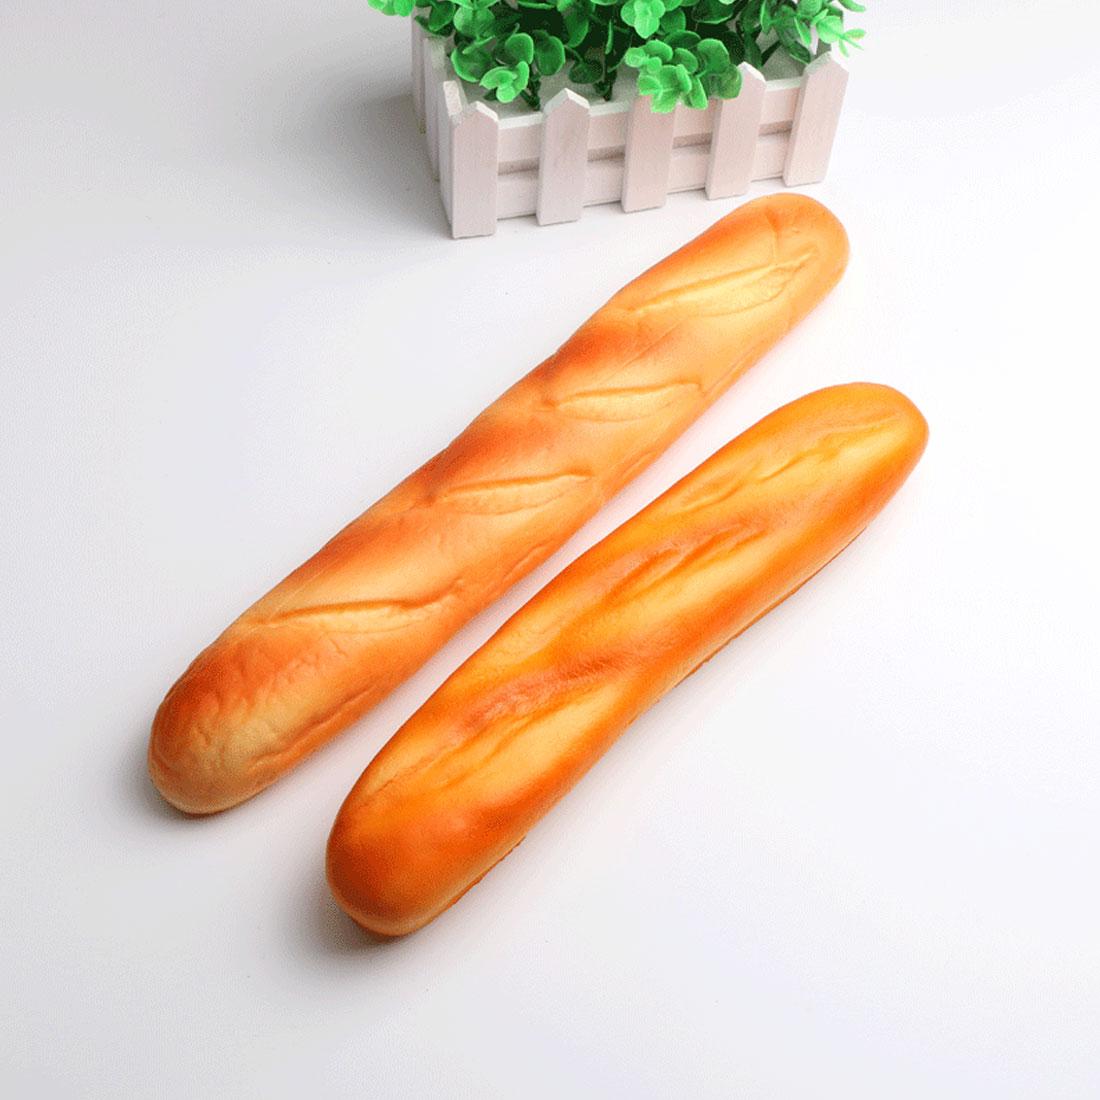 Etmakit Cute French Baguettes Kawaii Squishy Rising Jumbo Phone